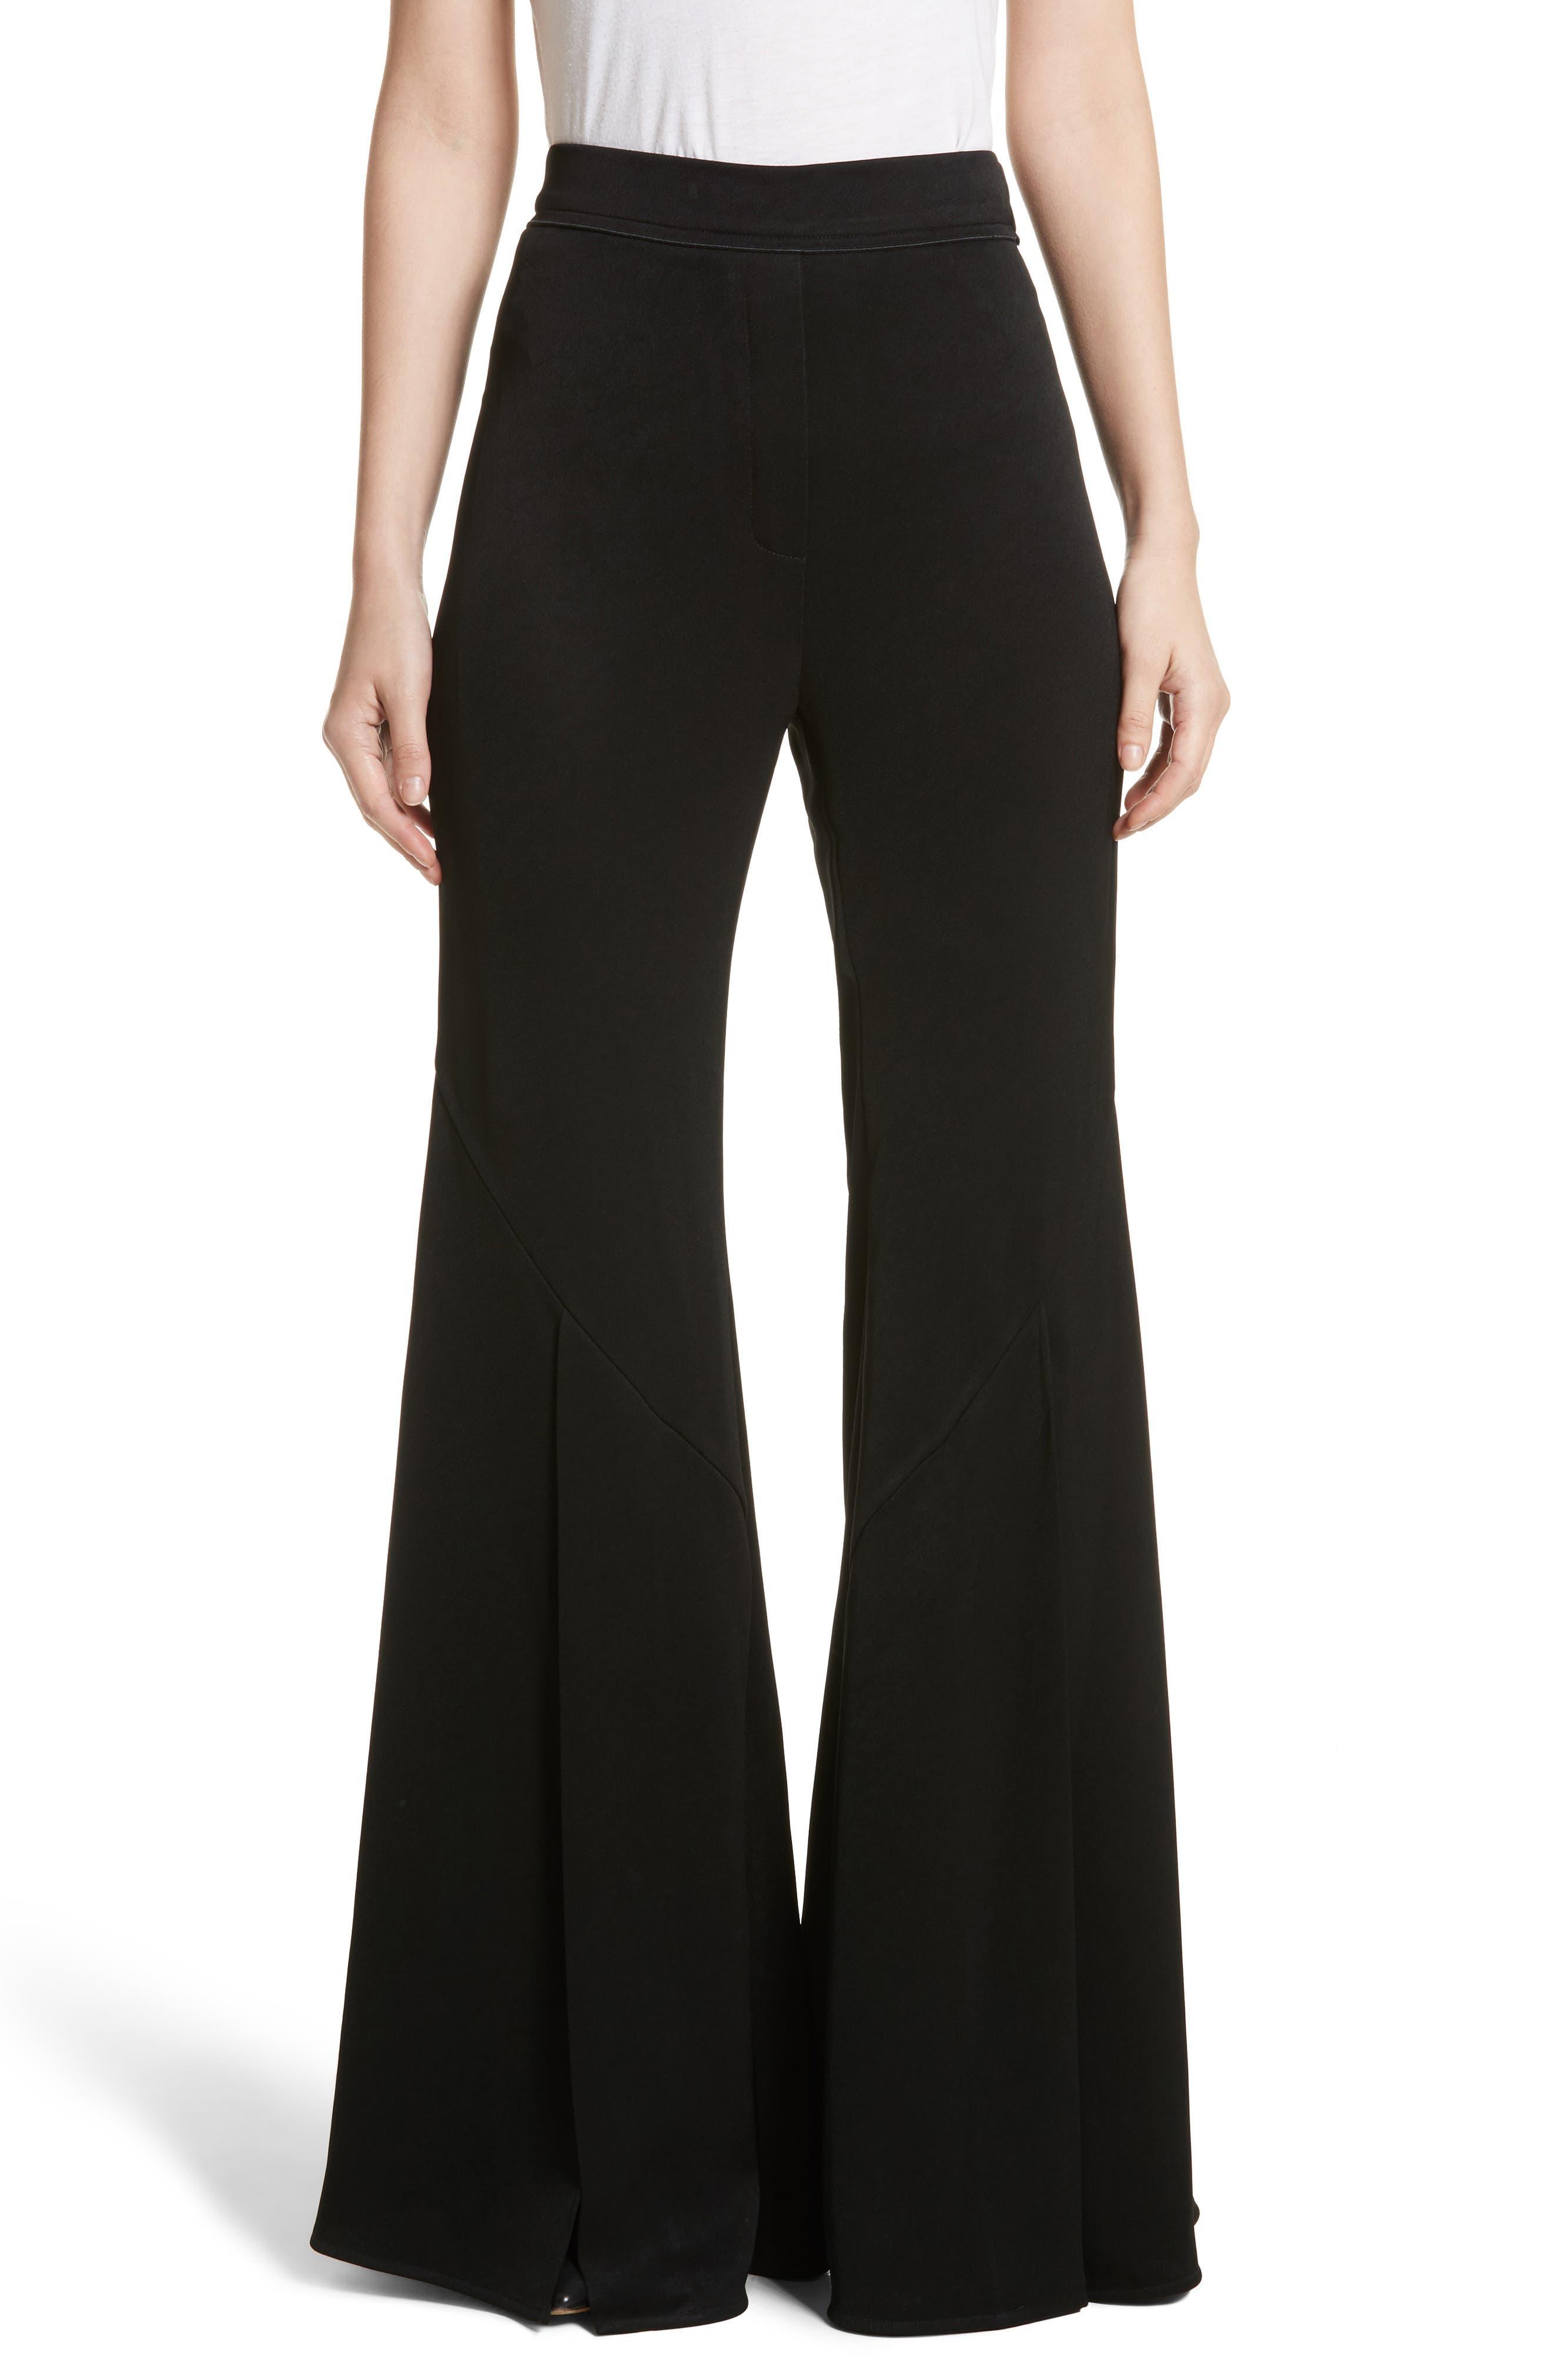 Higher & Higher Wide Flare Leg Pants,                             Main thumbnail 1, color,                             Black